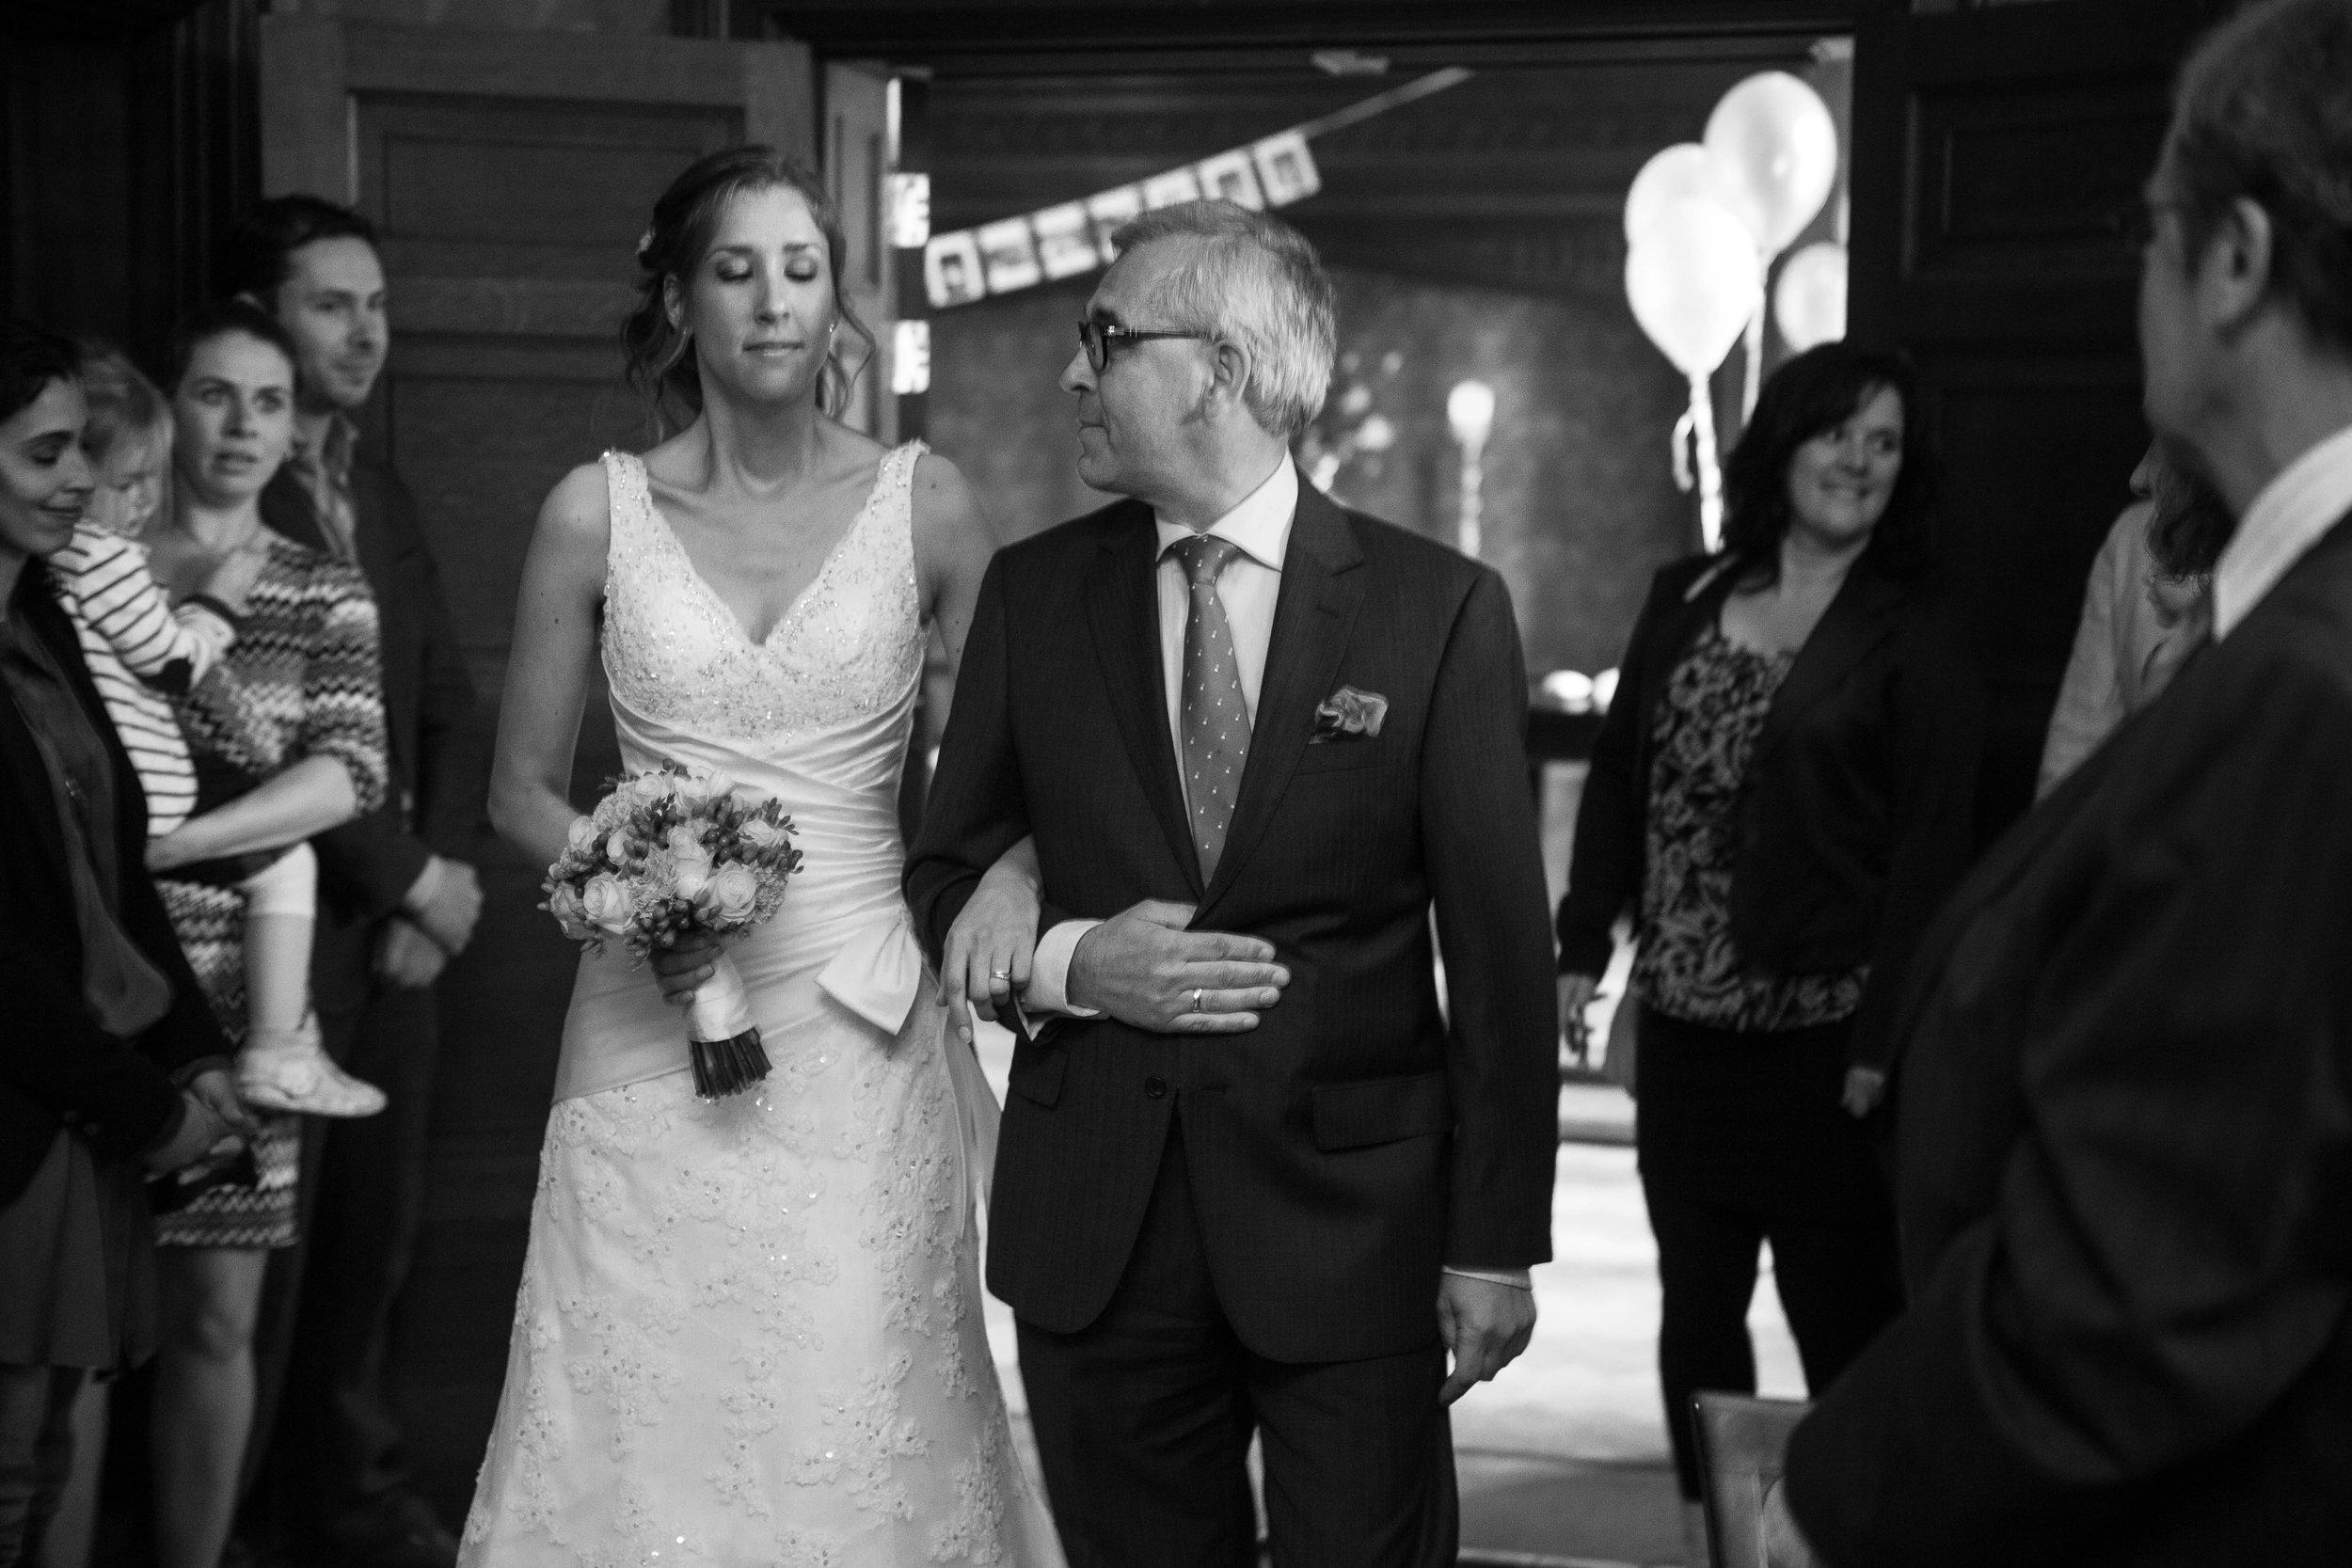 bruidsfotografie-trouwreportage-huwelijksfotografie-bruidsfotograaf-feestfotografie-Elise en Maarten-136.jpg